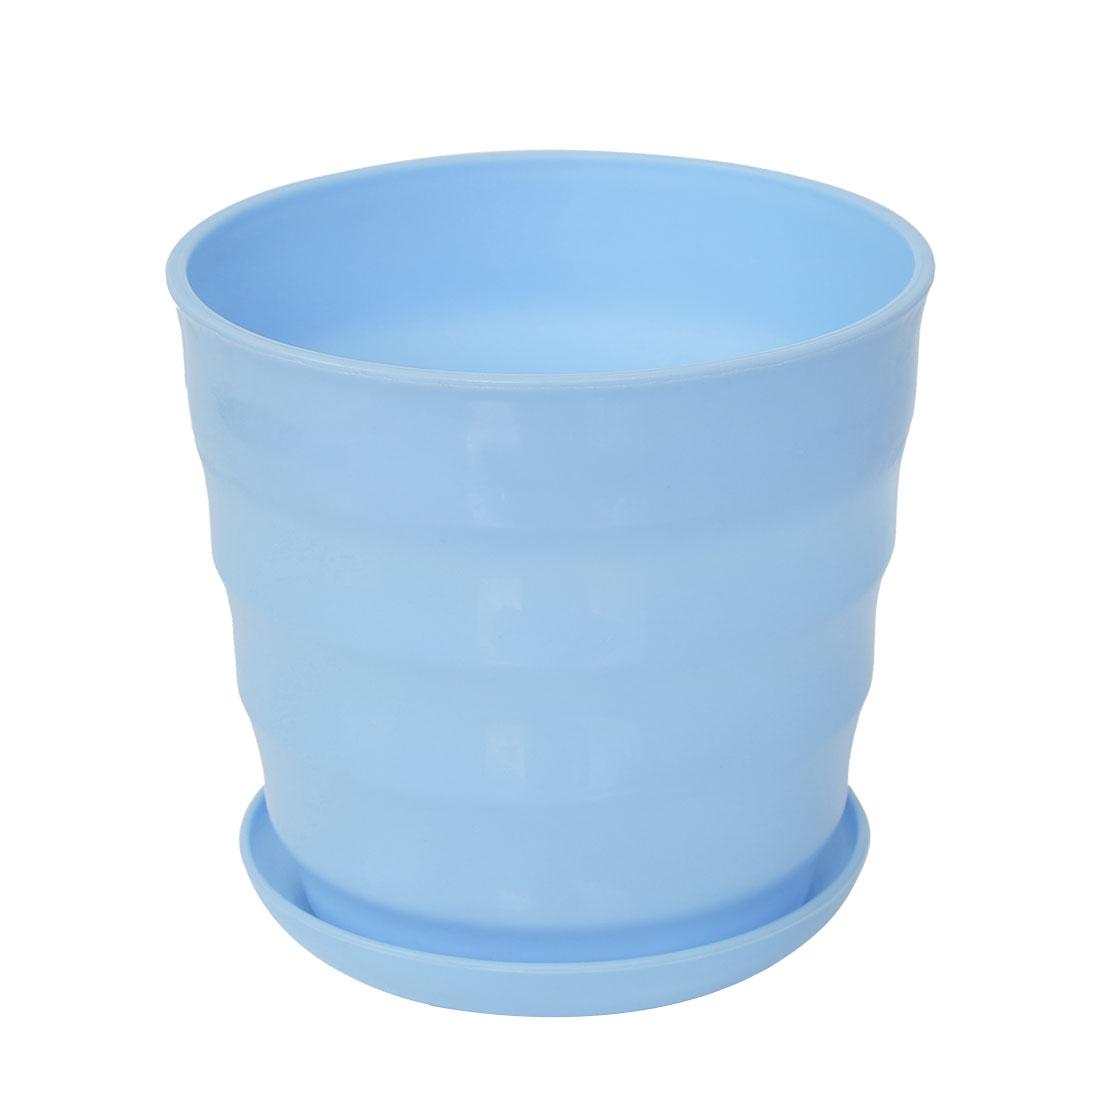 Home Office Desk Plastic Round Plant Planter Flower Pot Sky Blue 5 Inch Dia